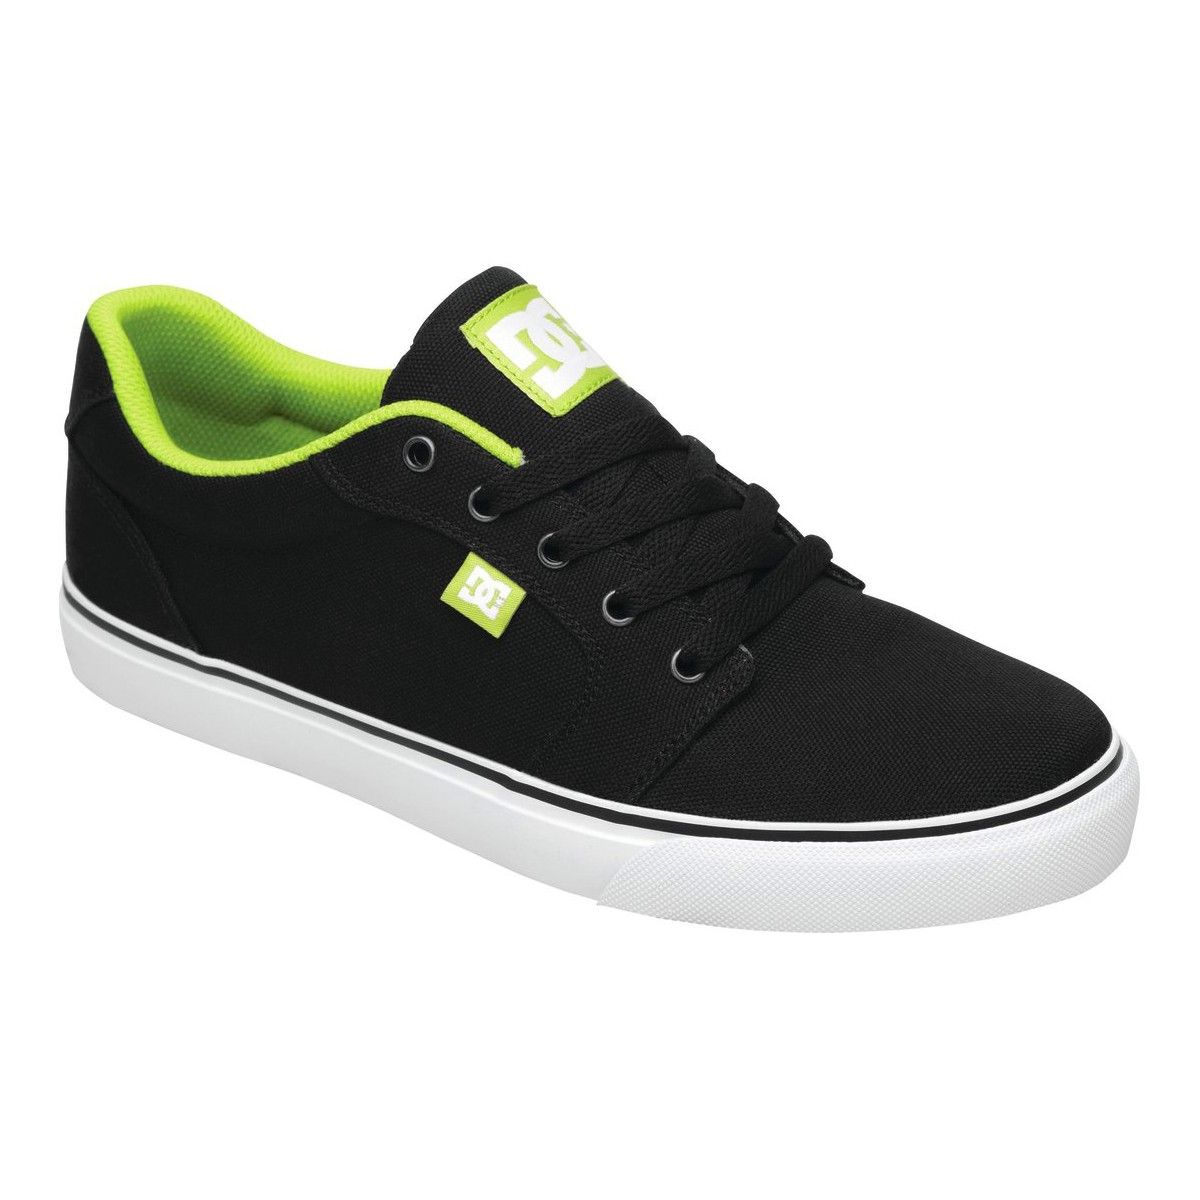 DC Shoes Anvil TX Shoe black soft lime ksl chaussures de skate 75€ #dc #dcshoes #spring2013 #men #man #skate #skateboard #skateboarding #dcshoescousa #anviltx #dcanviltx #homme #chaussure #shoes #monster #monsterenergy #shoe #chaussures #skateshop